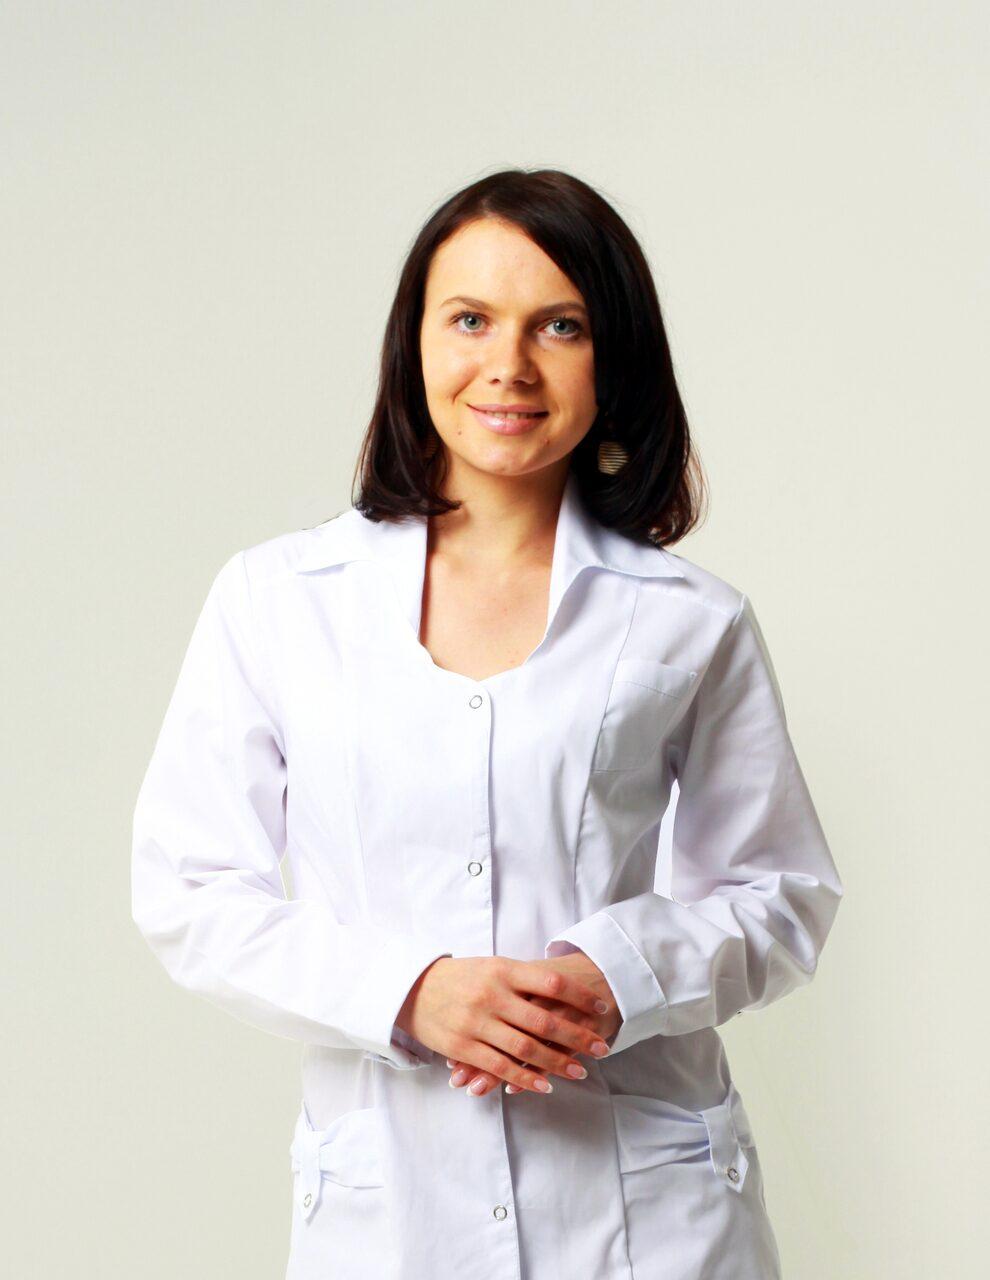 эротические медсестрички фото